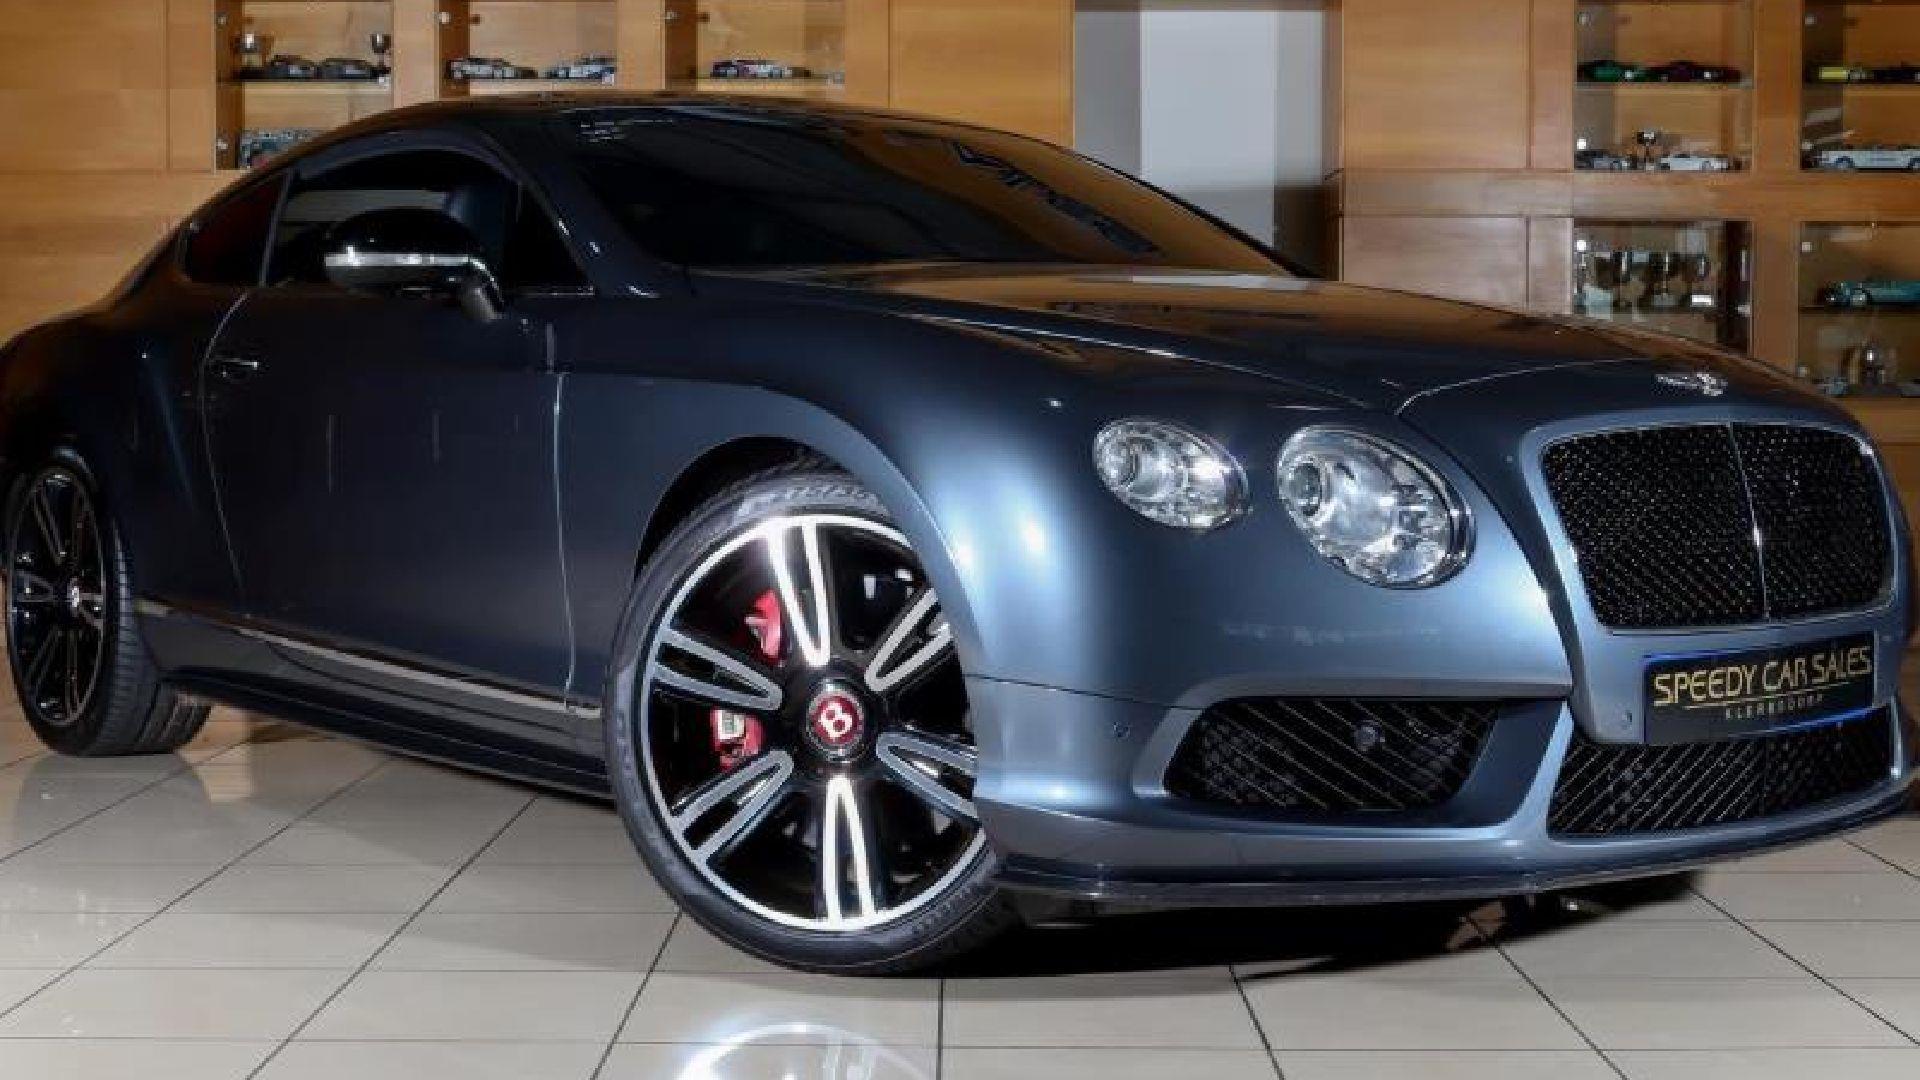 Bentley Continental (GT V8) at Speedy Car Sales